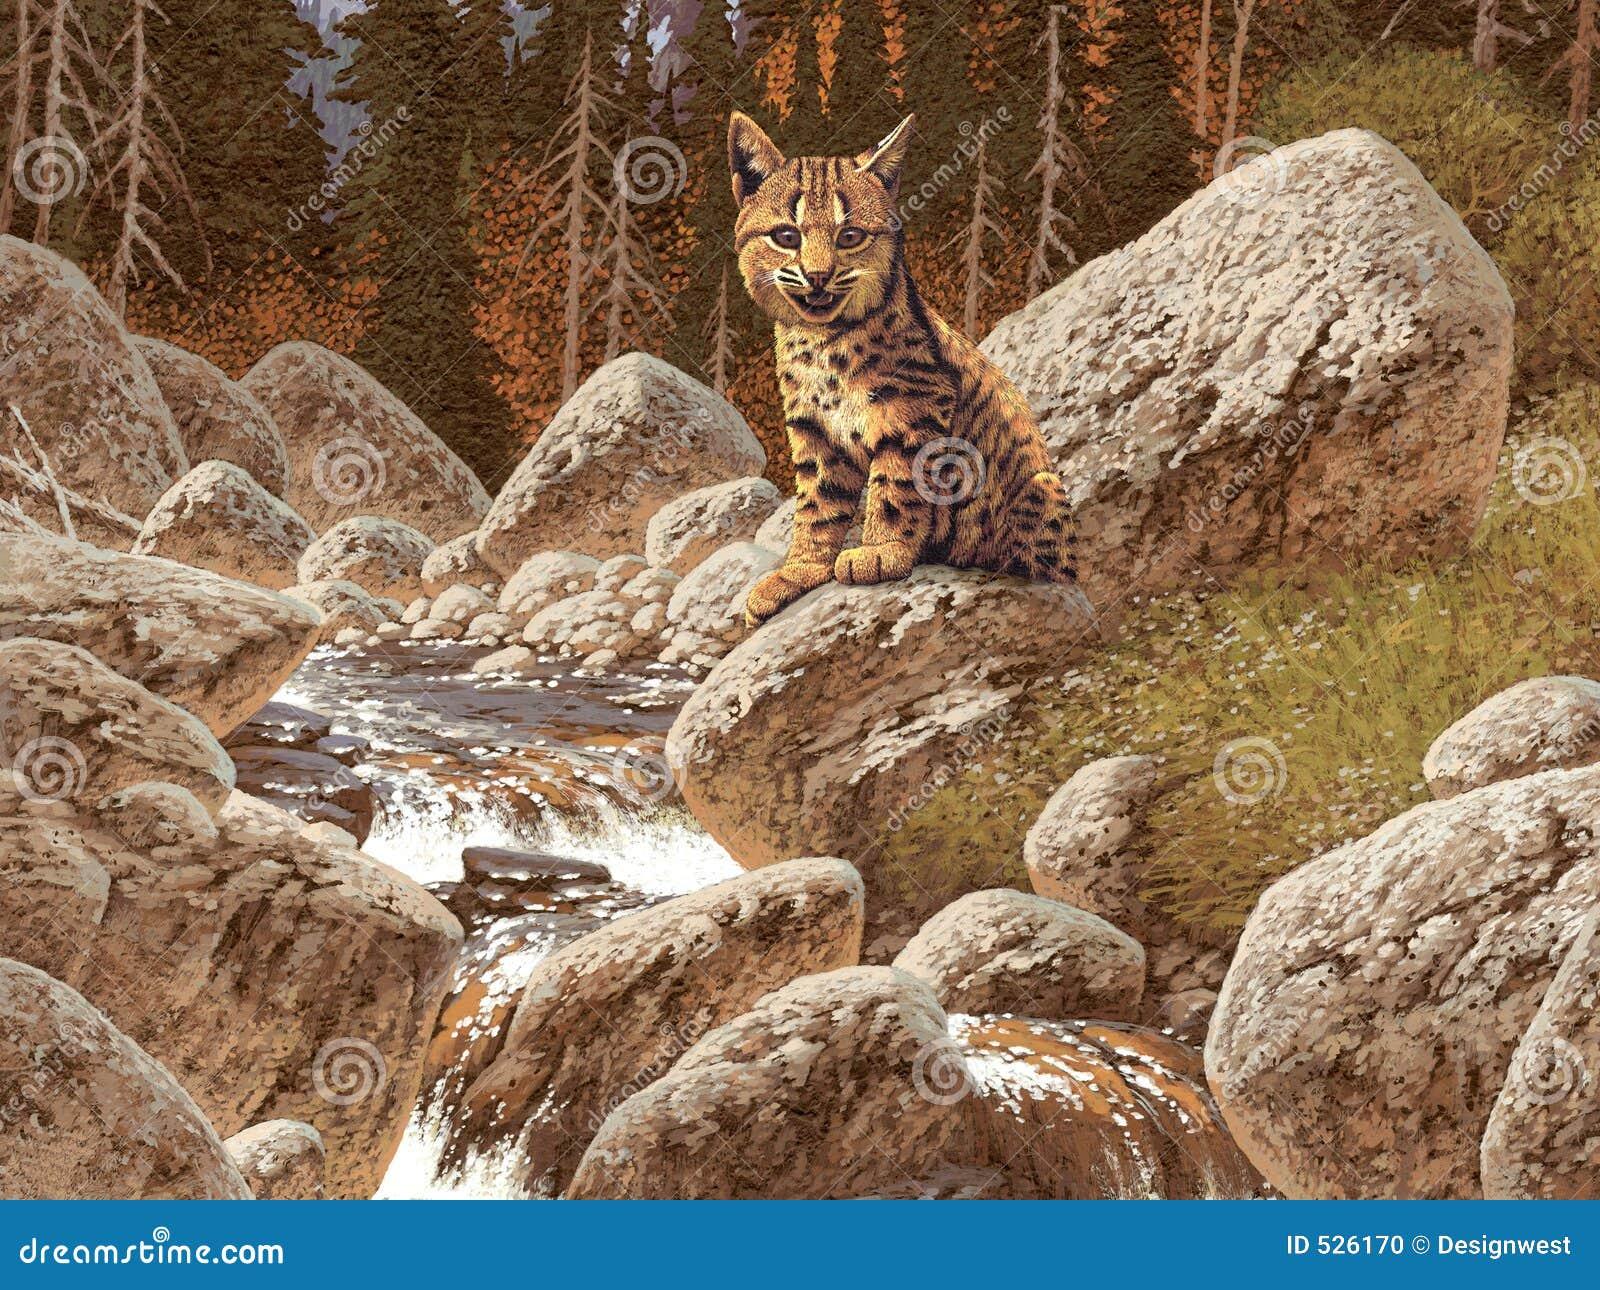 Download 美洲野猫 库存例证. 插画 包括有 杉木, 西方, 艺术, 峡谷, 原野, 通配, 西部, 敌意, 野生生物 - 526170